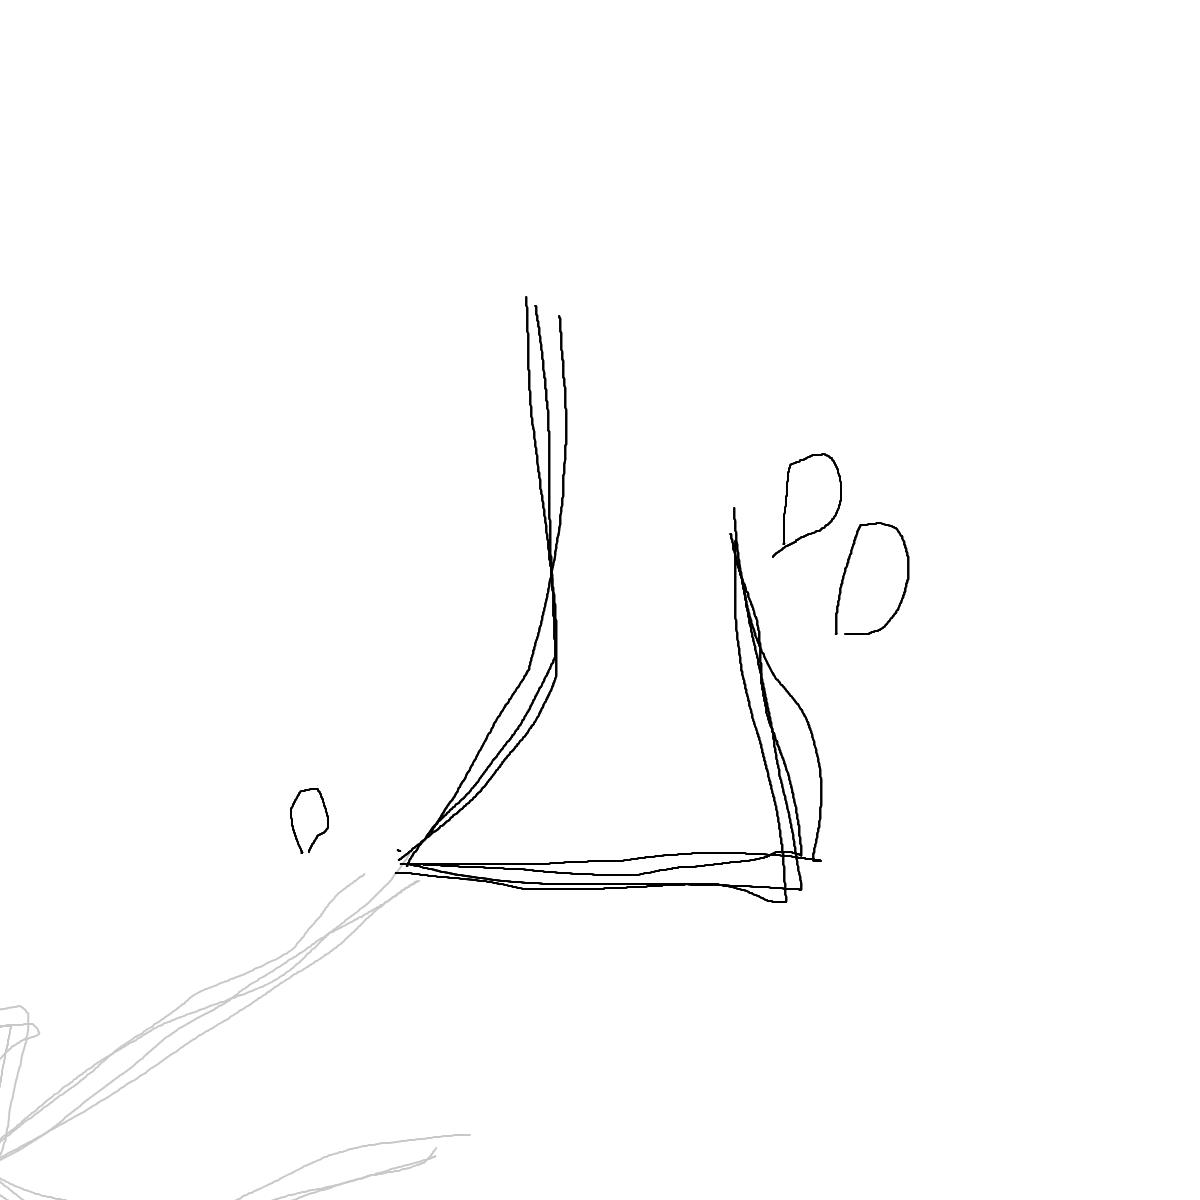 BAAAM drawing#16998 lat:45.5558433532714840lng: -73.6643981933593800